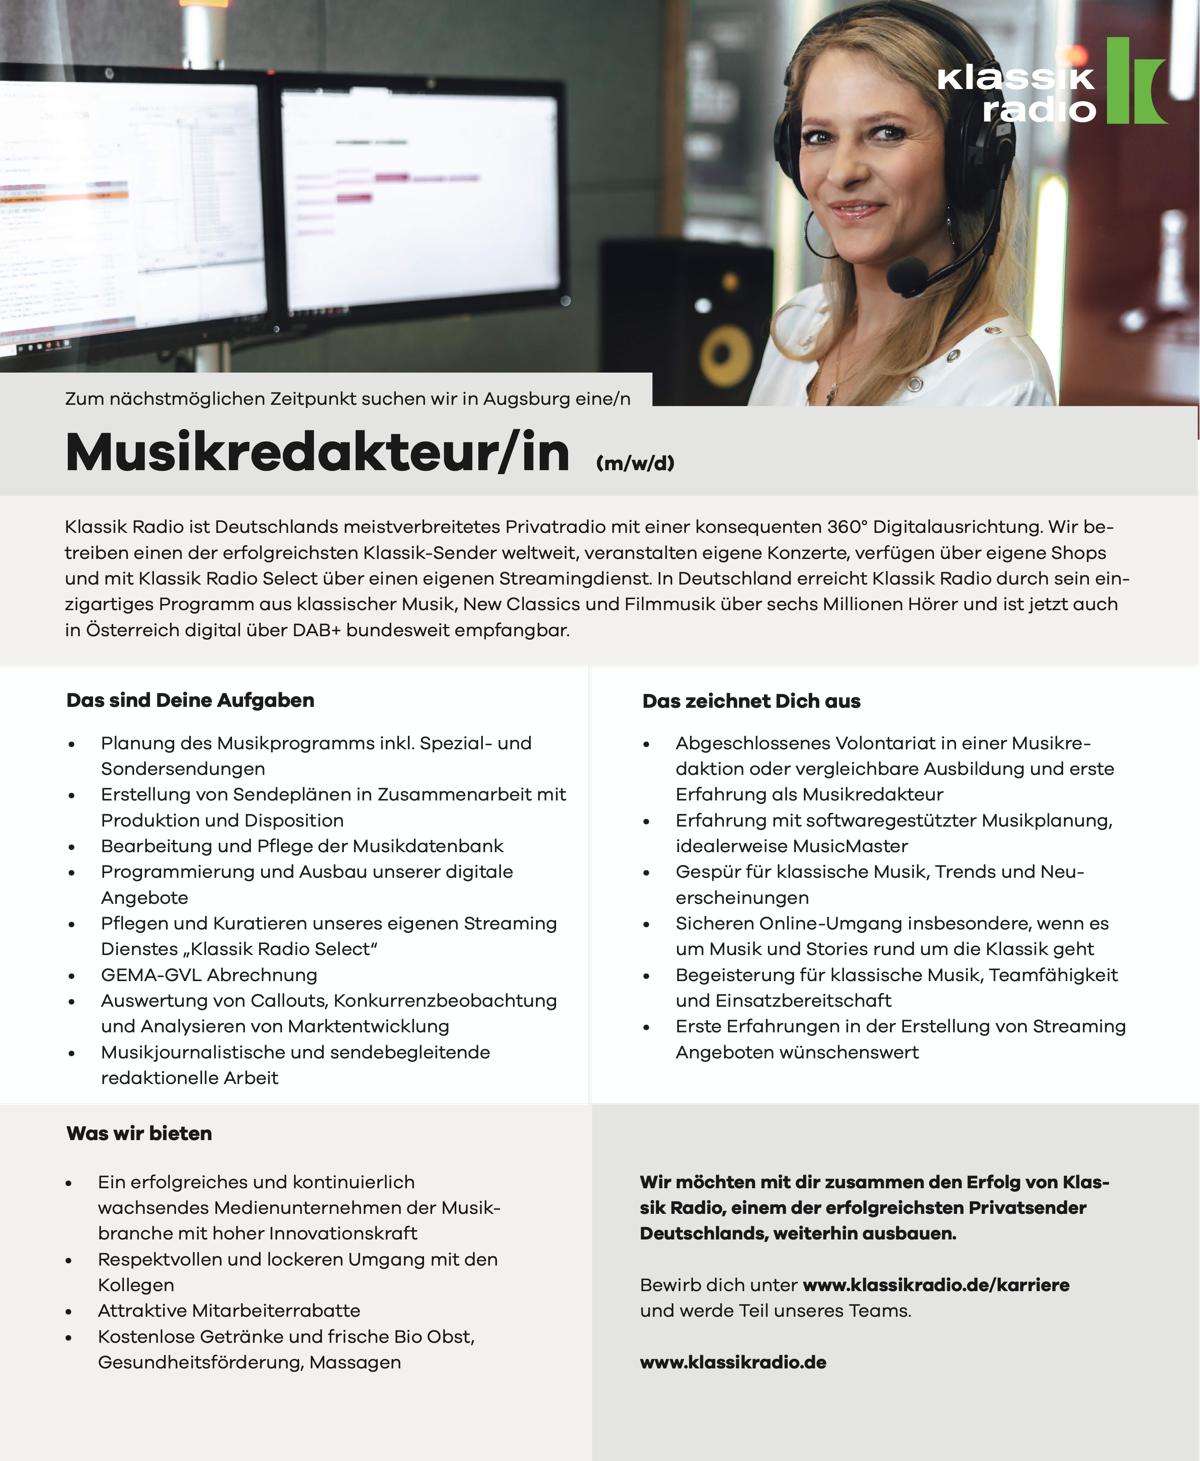 Klassik Radio sucht Musikredakteur/in (m/w/d)